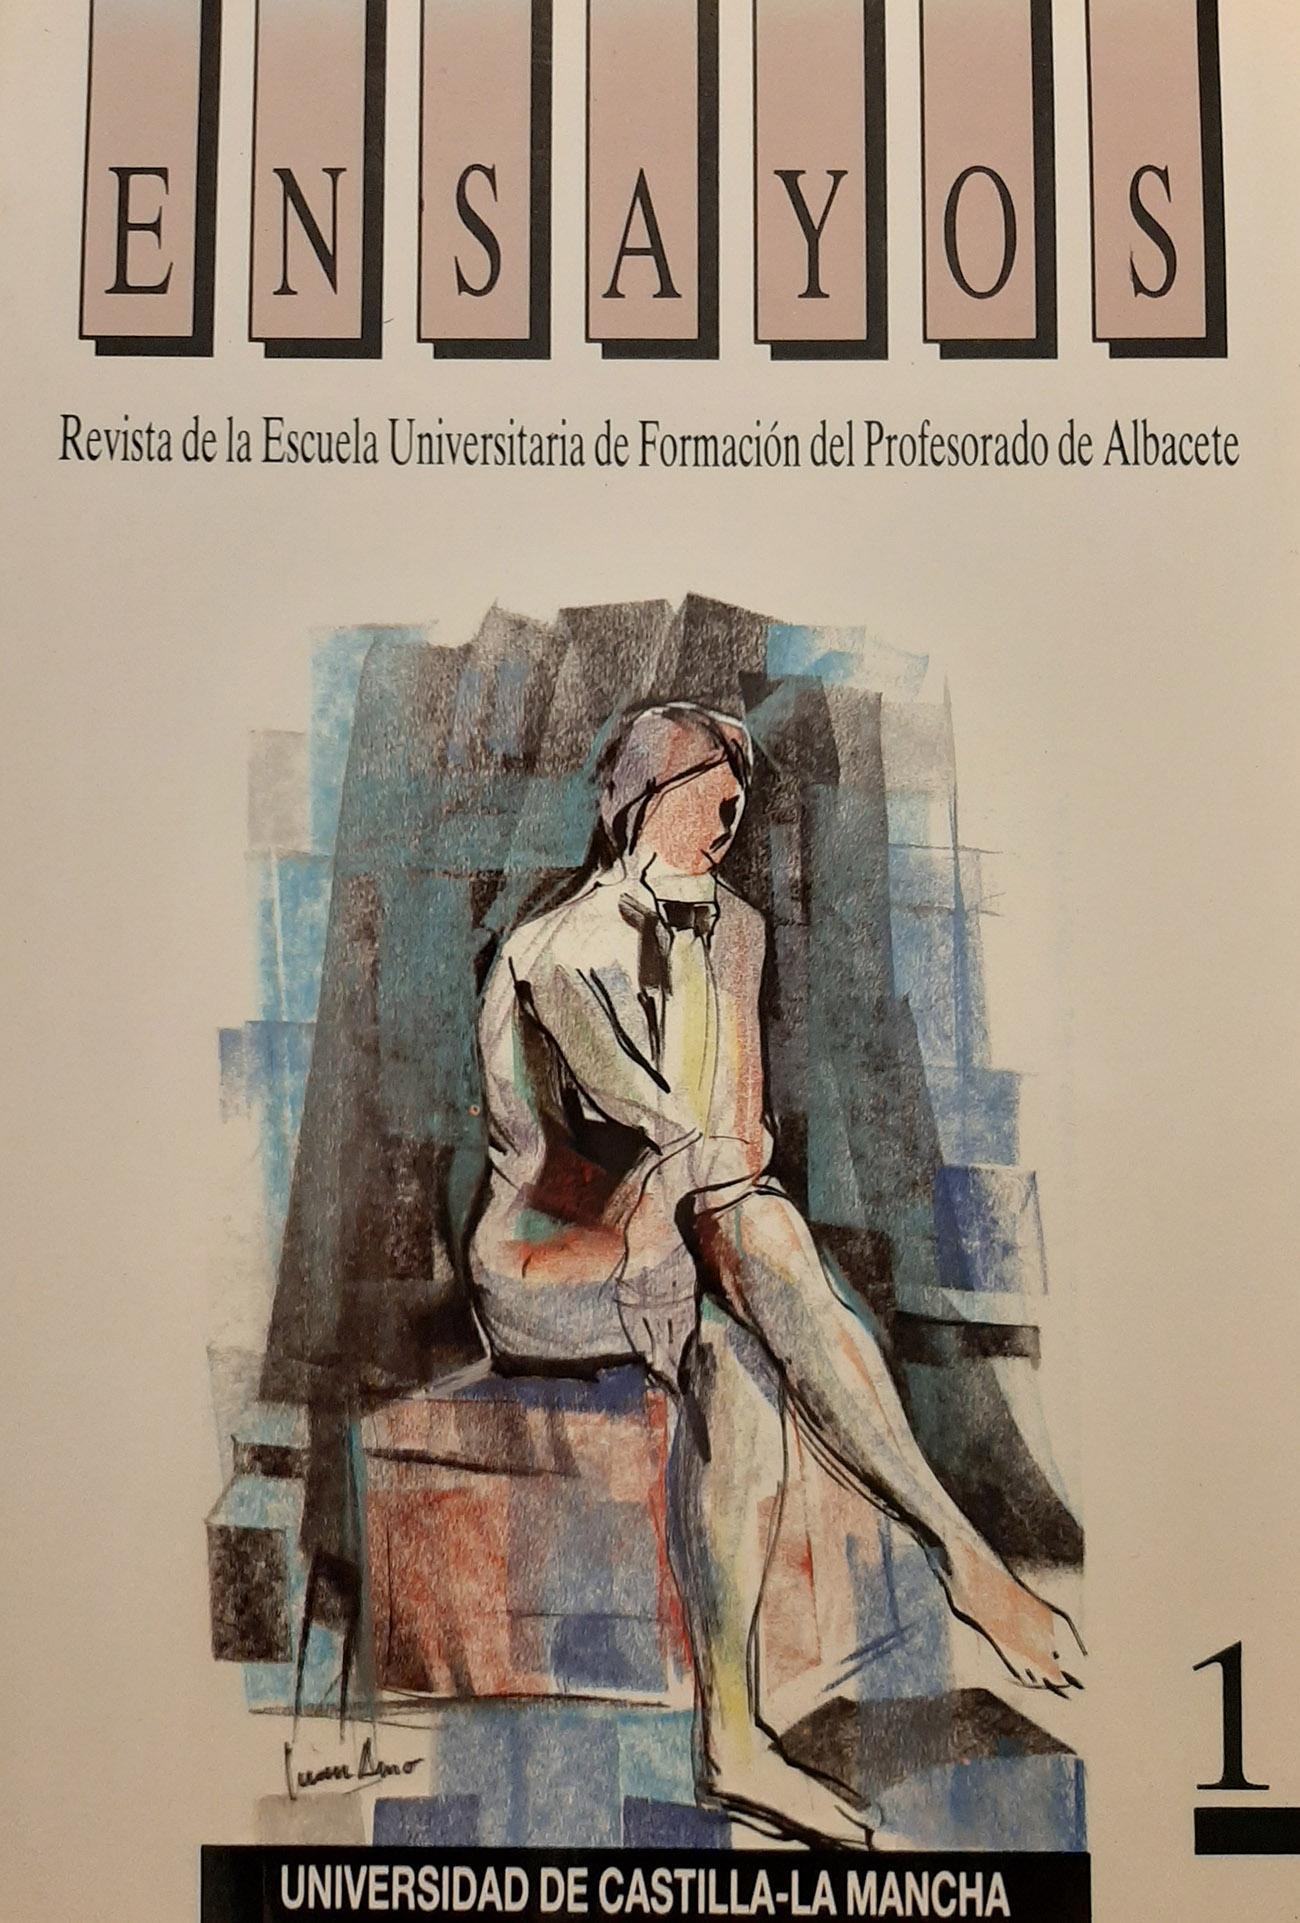 Juan Amo. (1997). Portada Revista Ensayos.